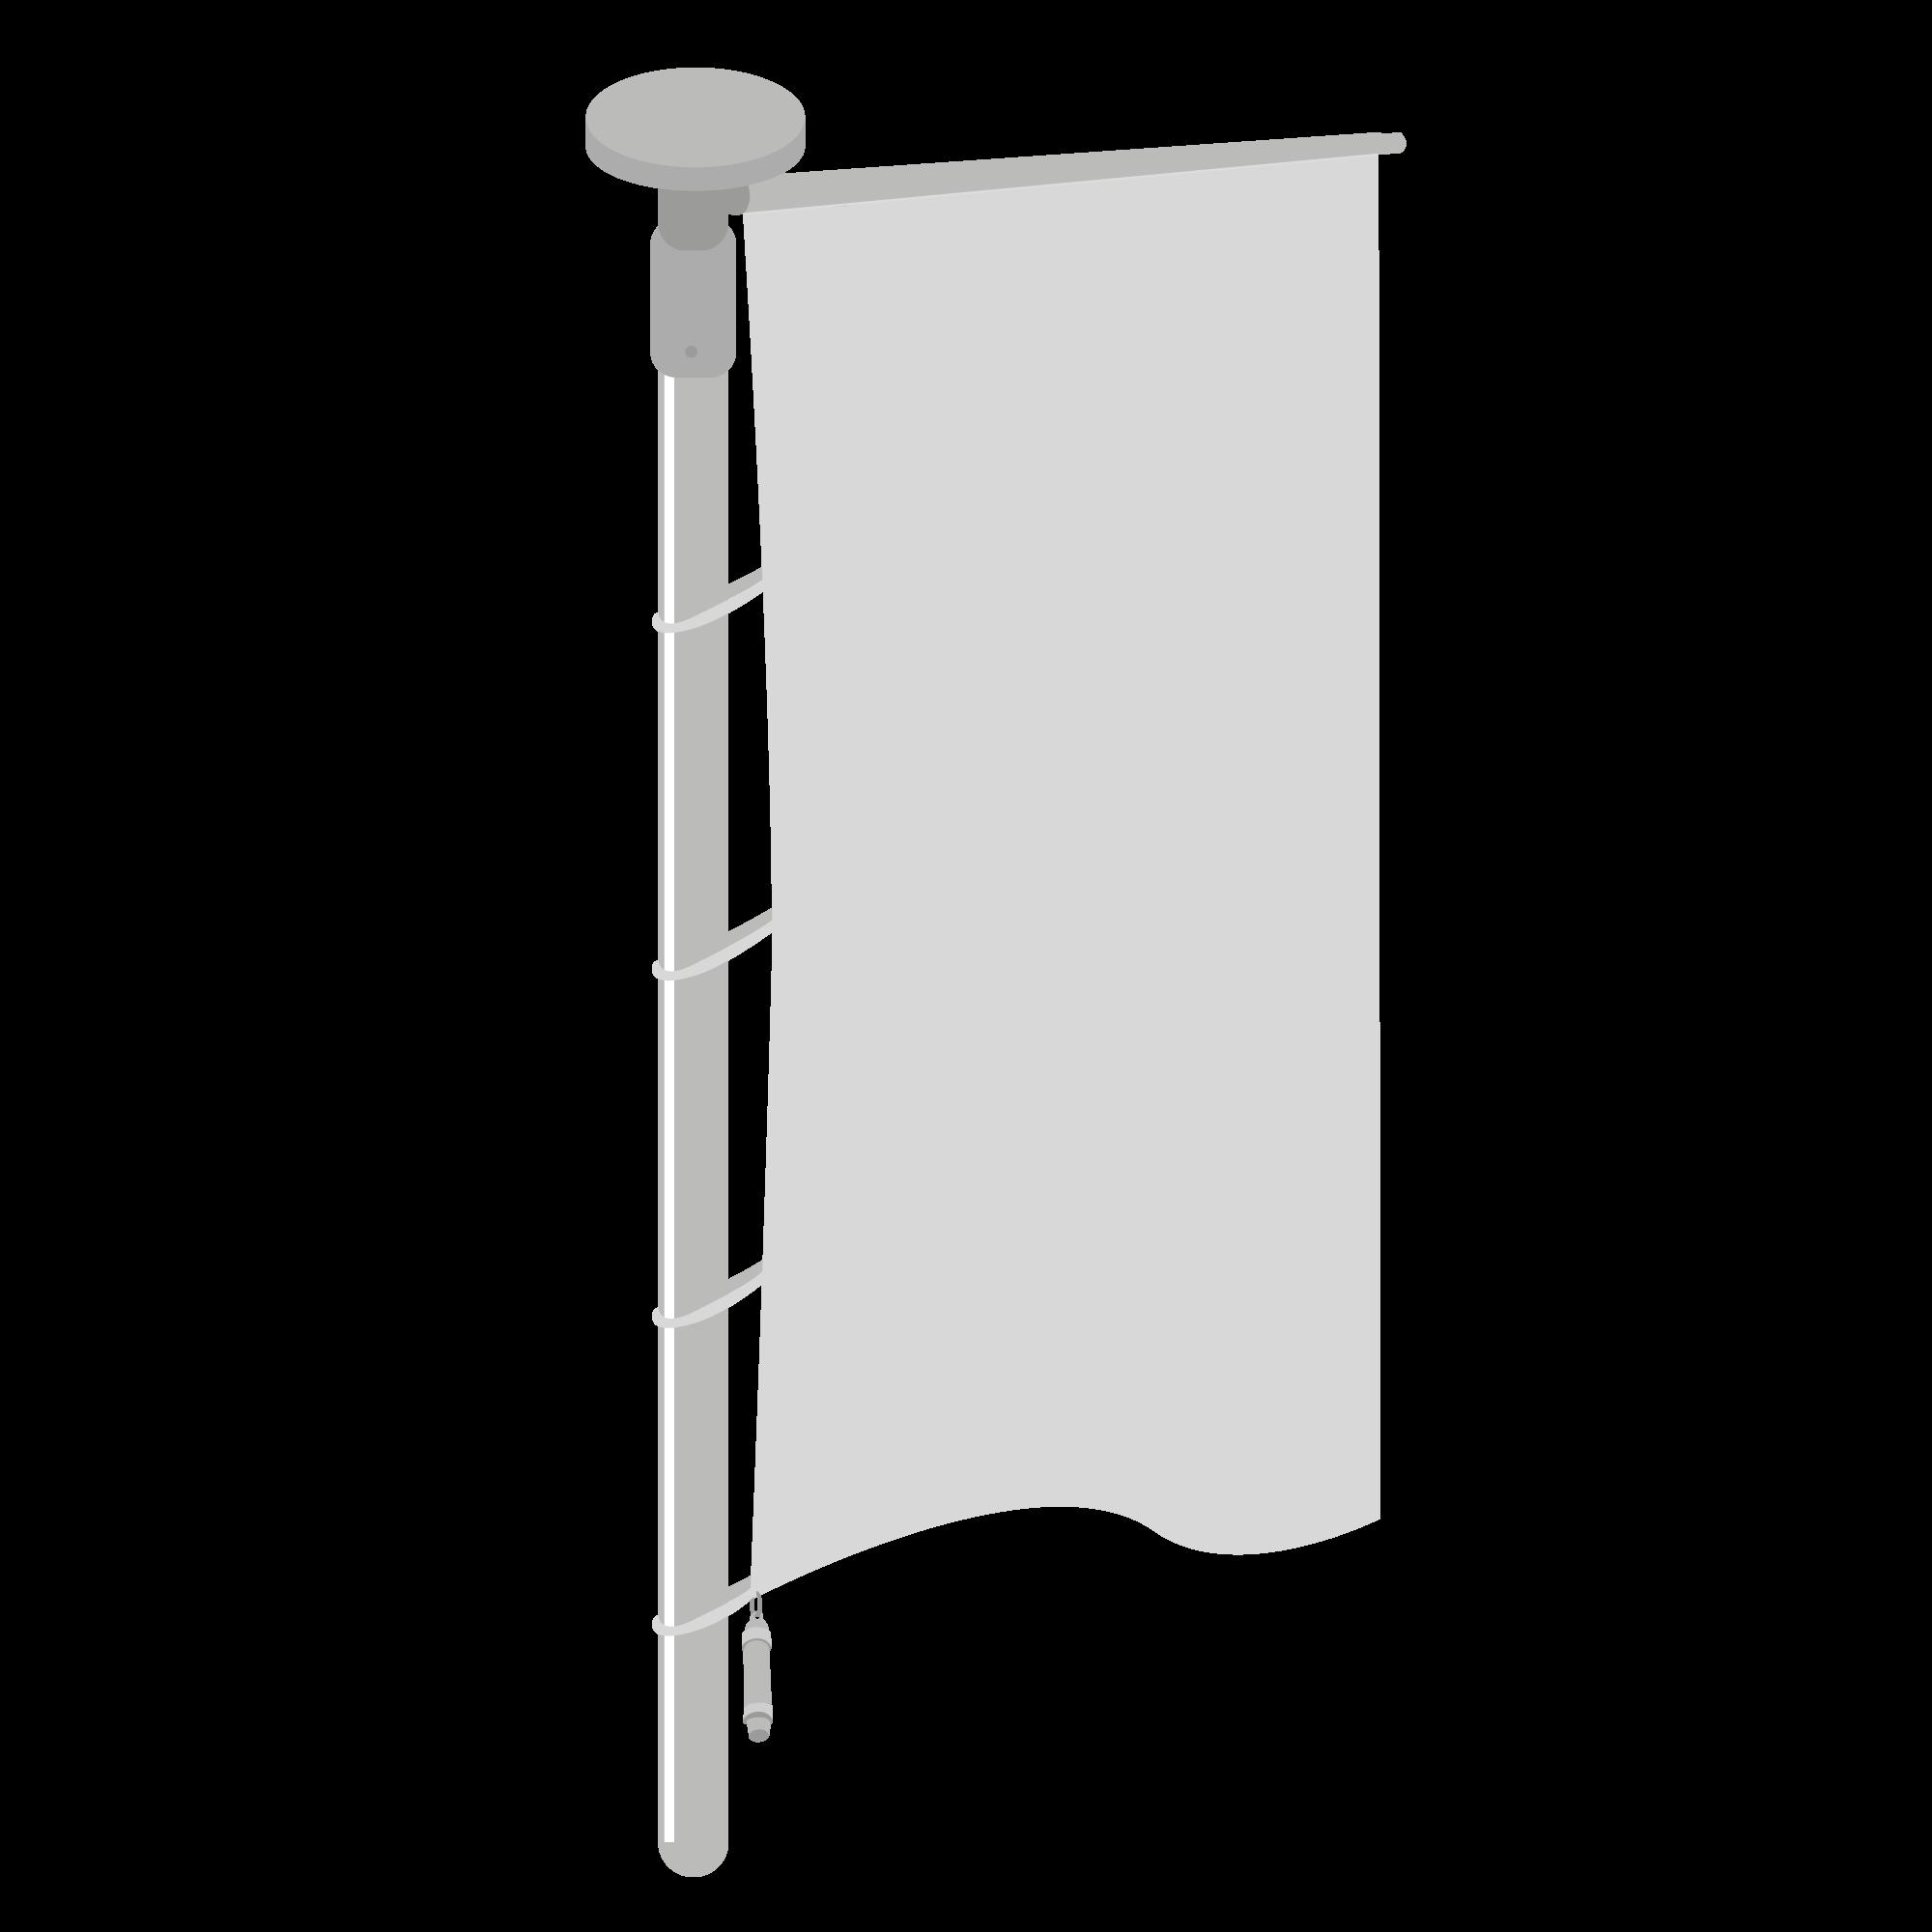 Baniermasten - Signaal Vlaggenservice